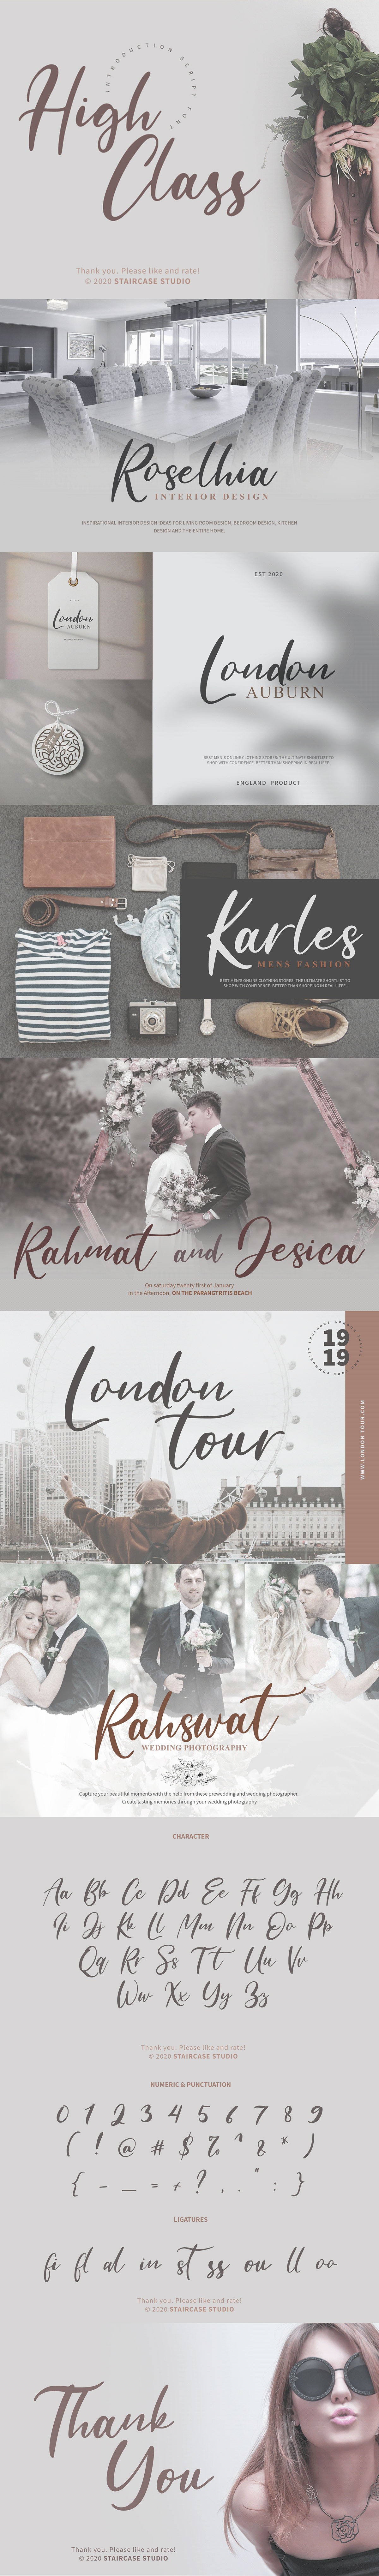 brand branding  font fonts HIGH CLASS Invitation Landmark Logotype Script wedding